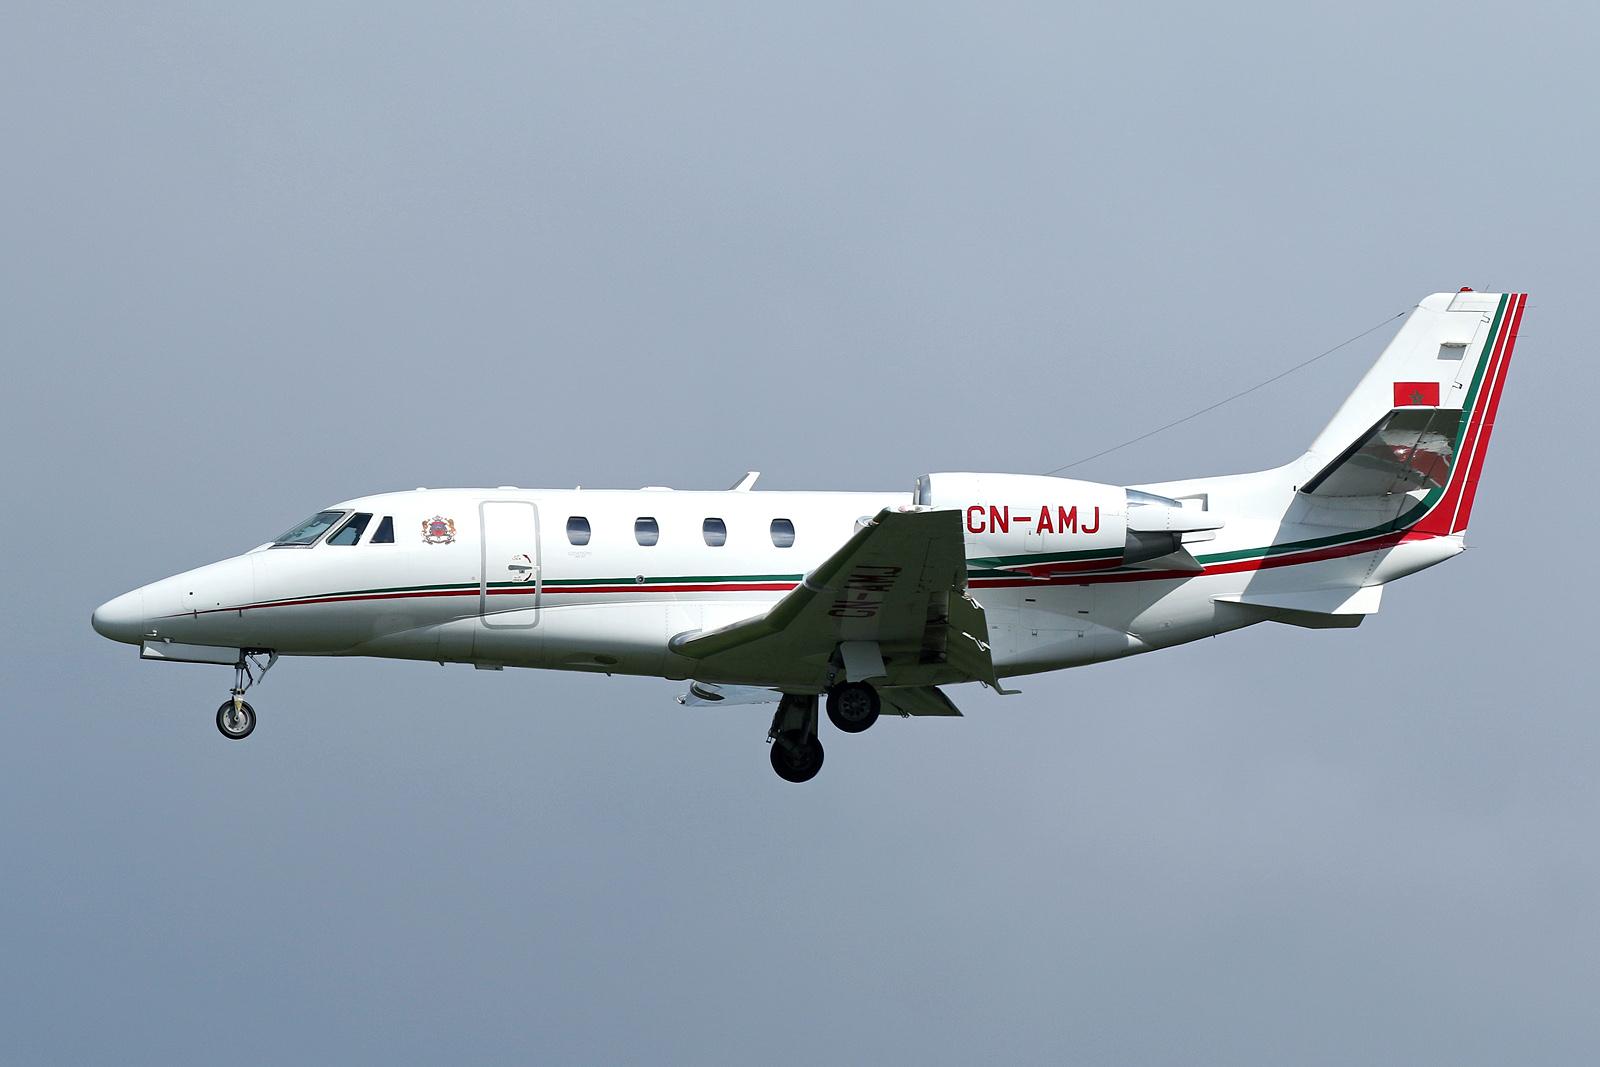 FRA: Avions VIP, Liaison & ECM - Page 19 41457969022_771801aaf2_o